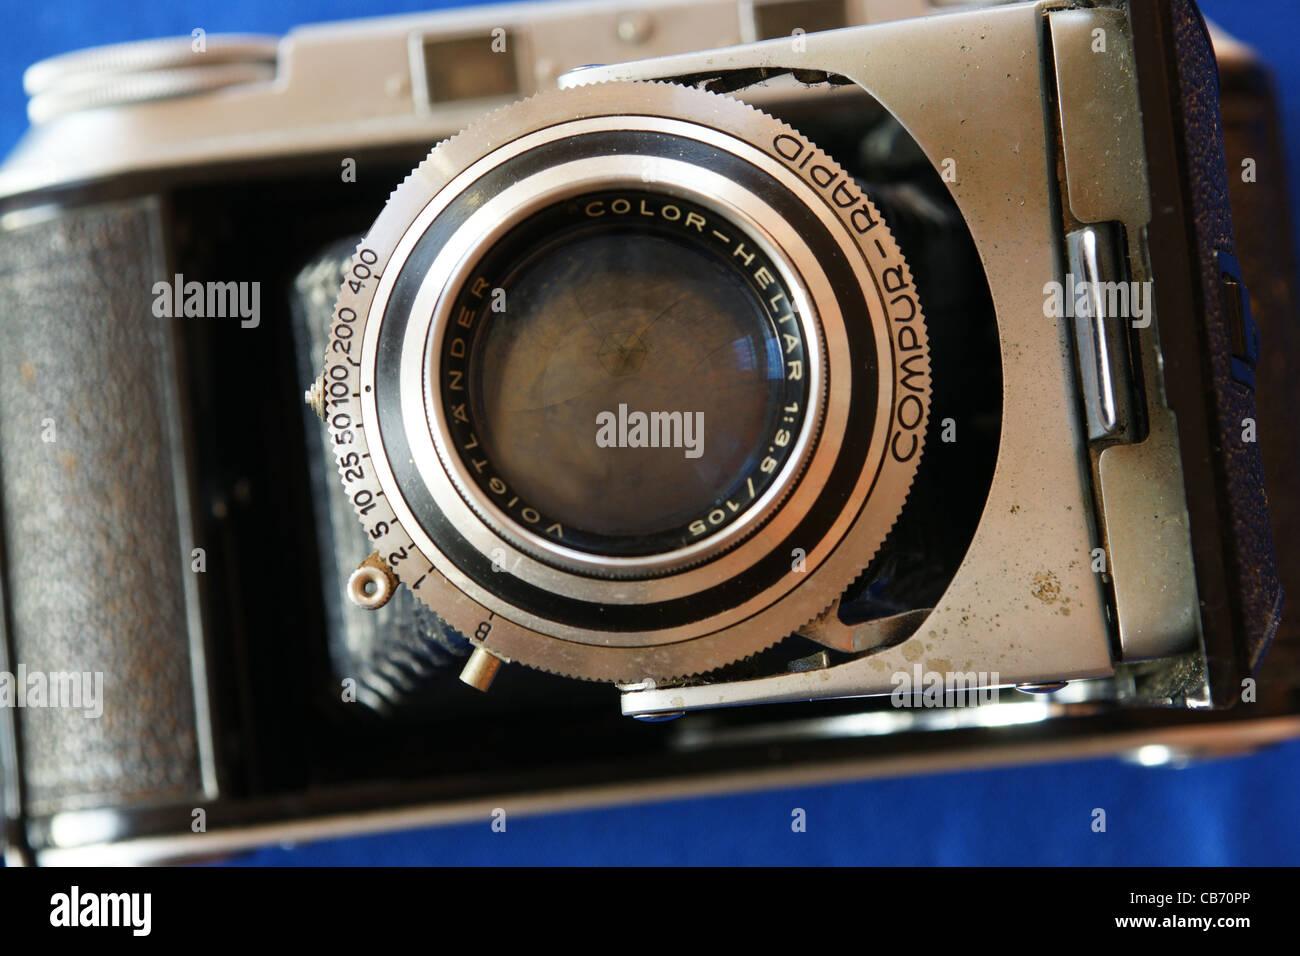 A vintage Voigtlander Bessa II folding bellows camera - Stock Image